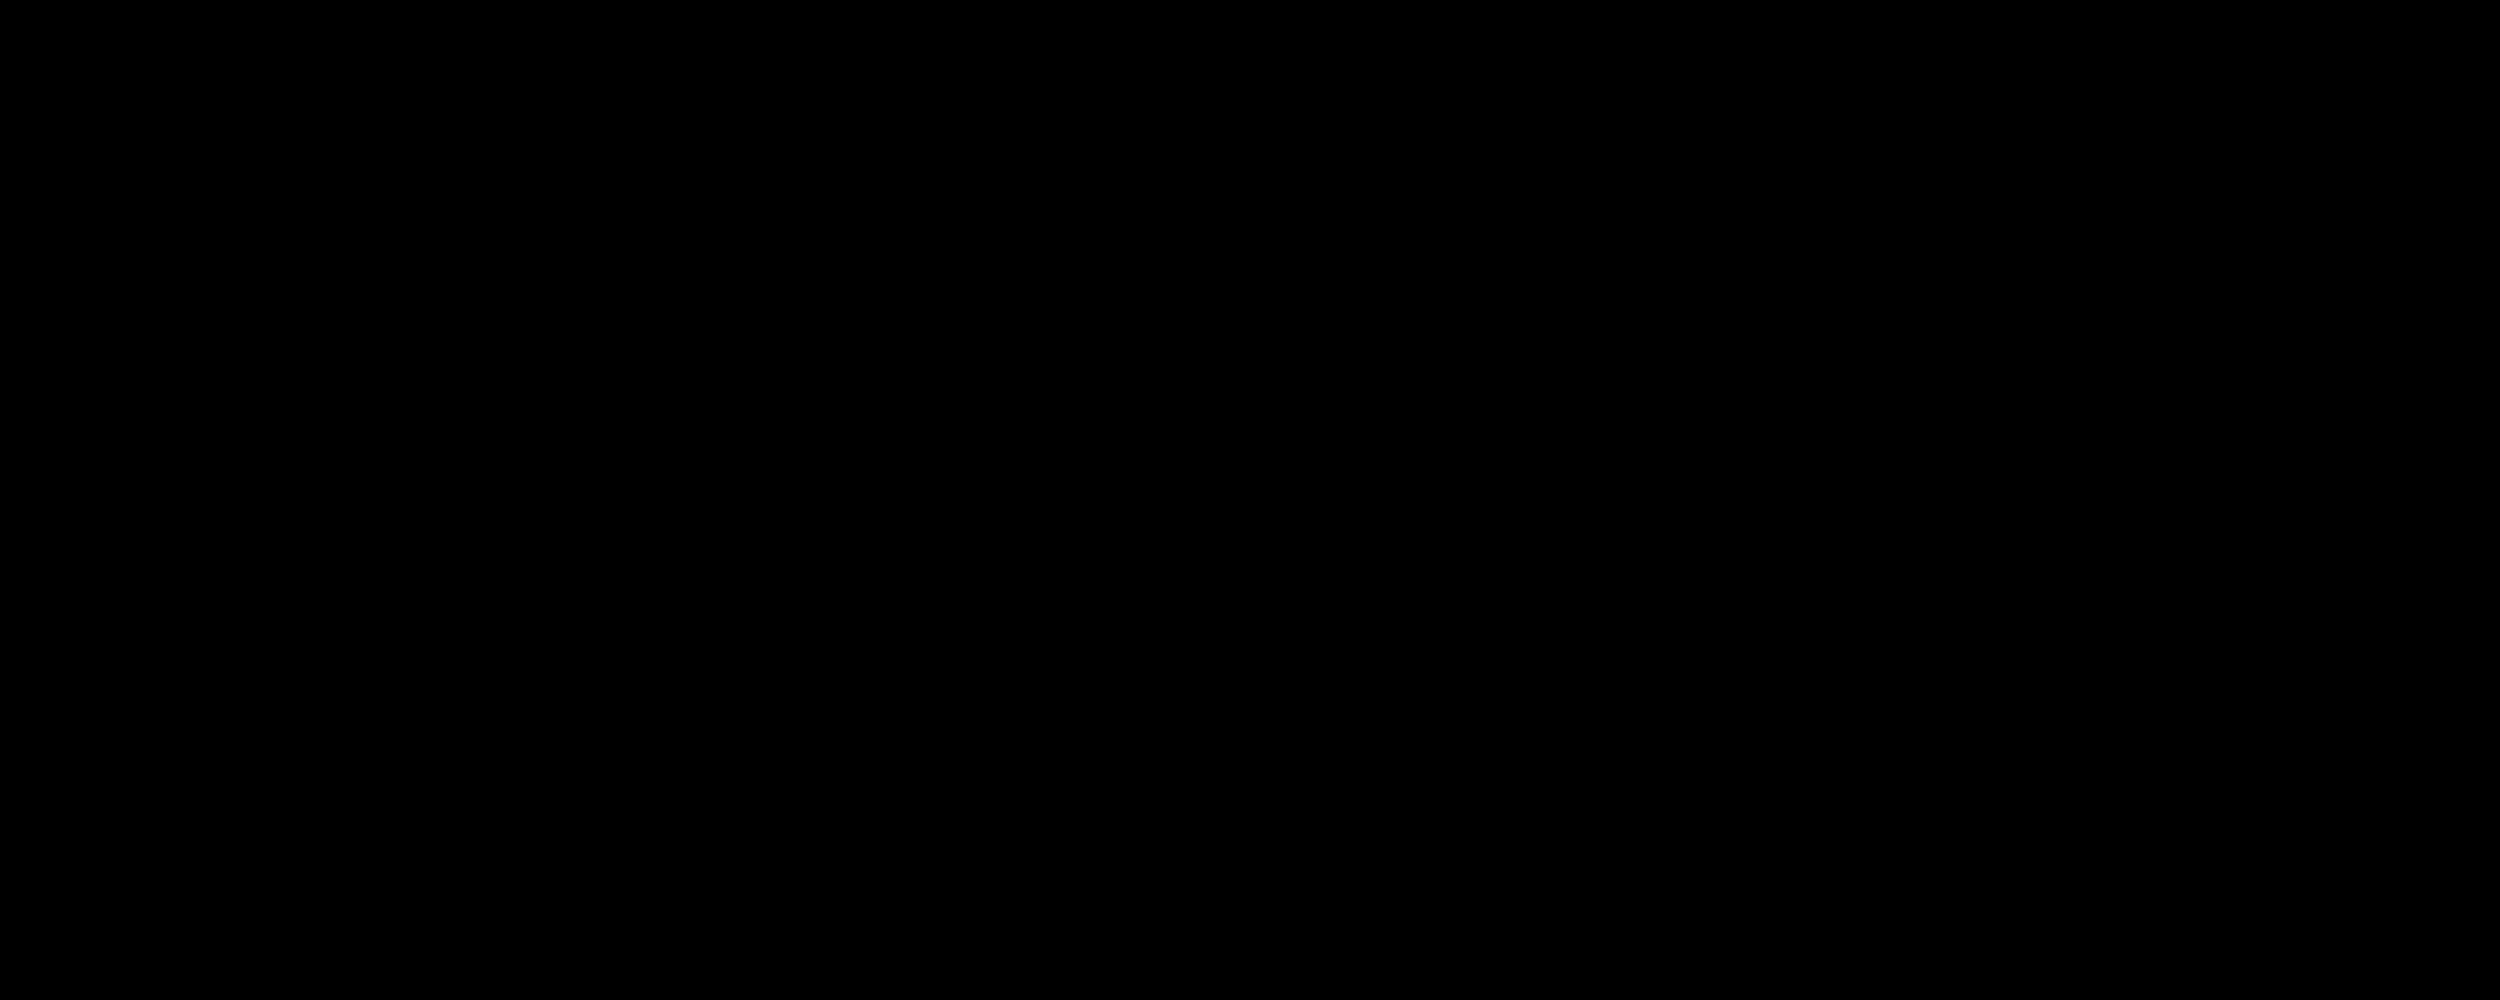 Sunday_Forever_Logo___Large_01.png